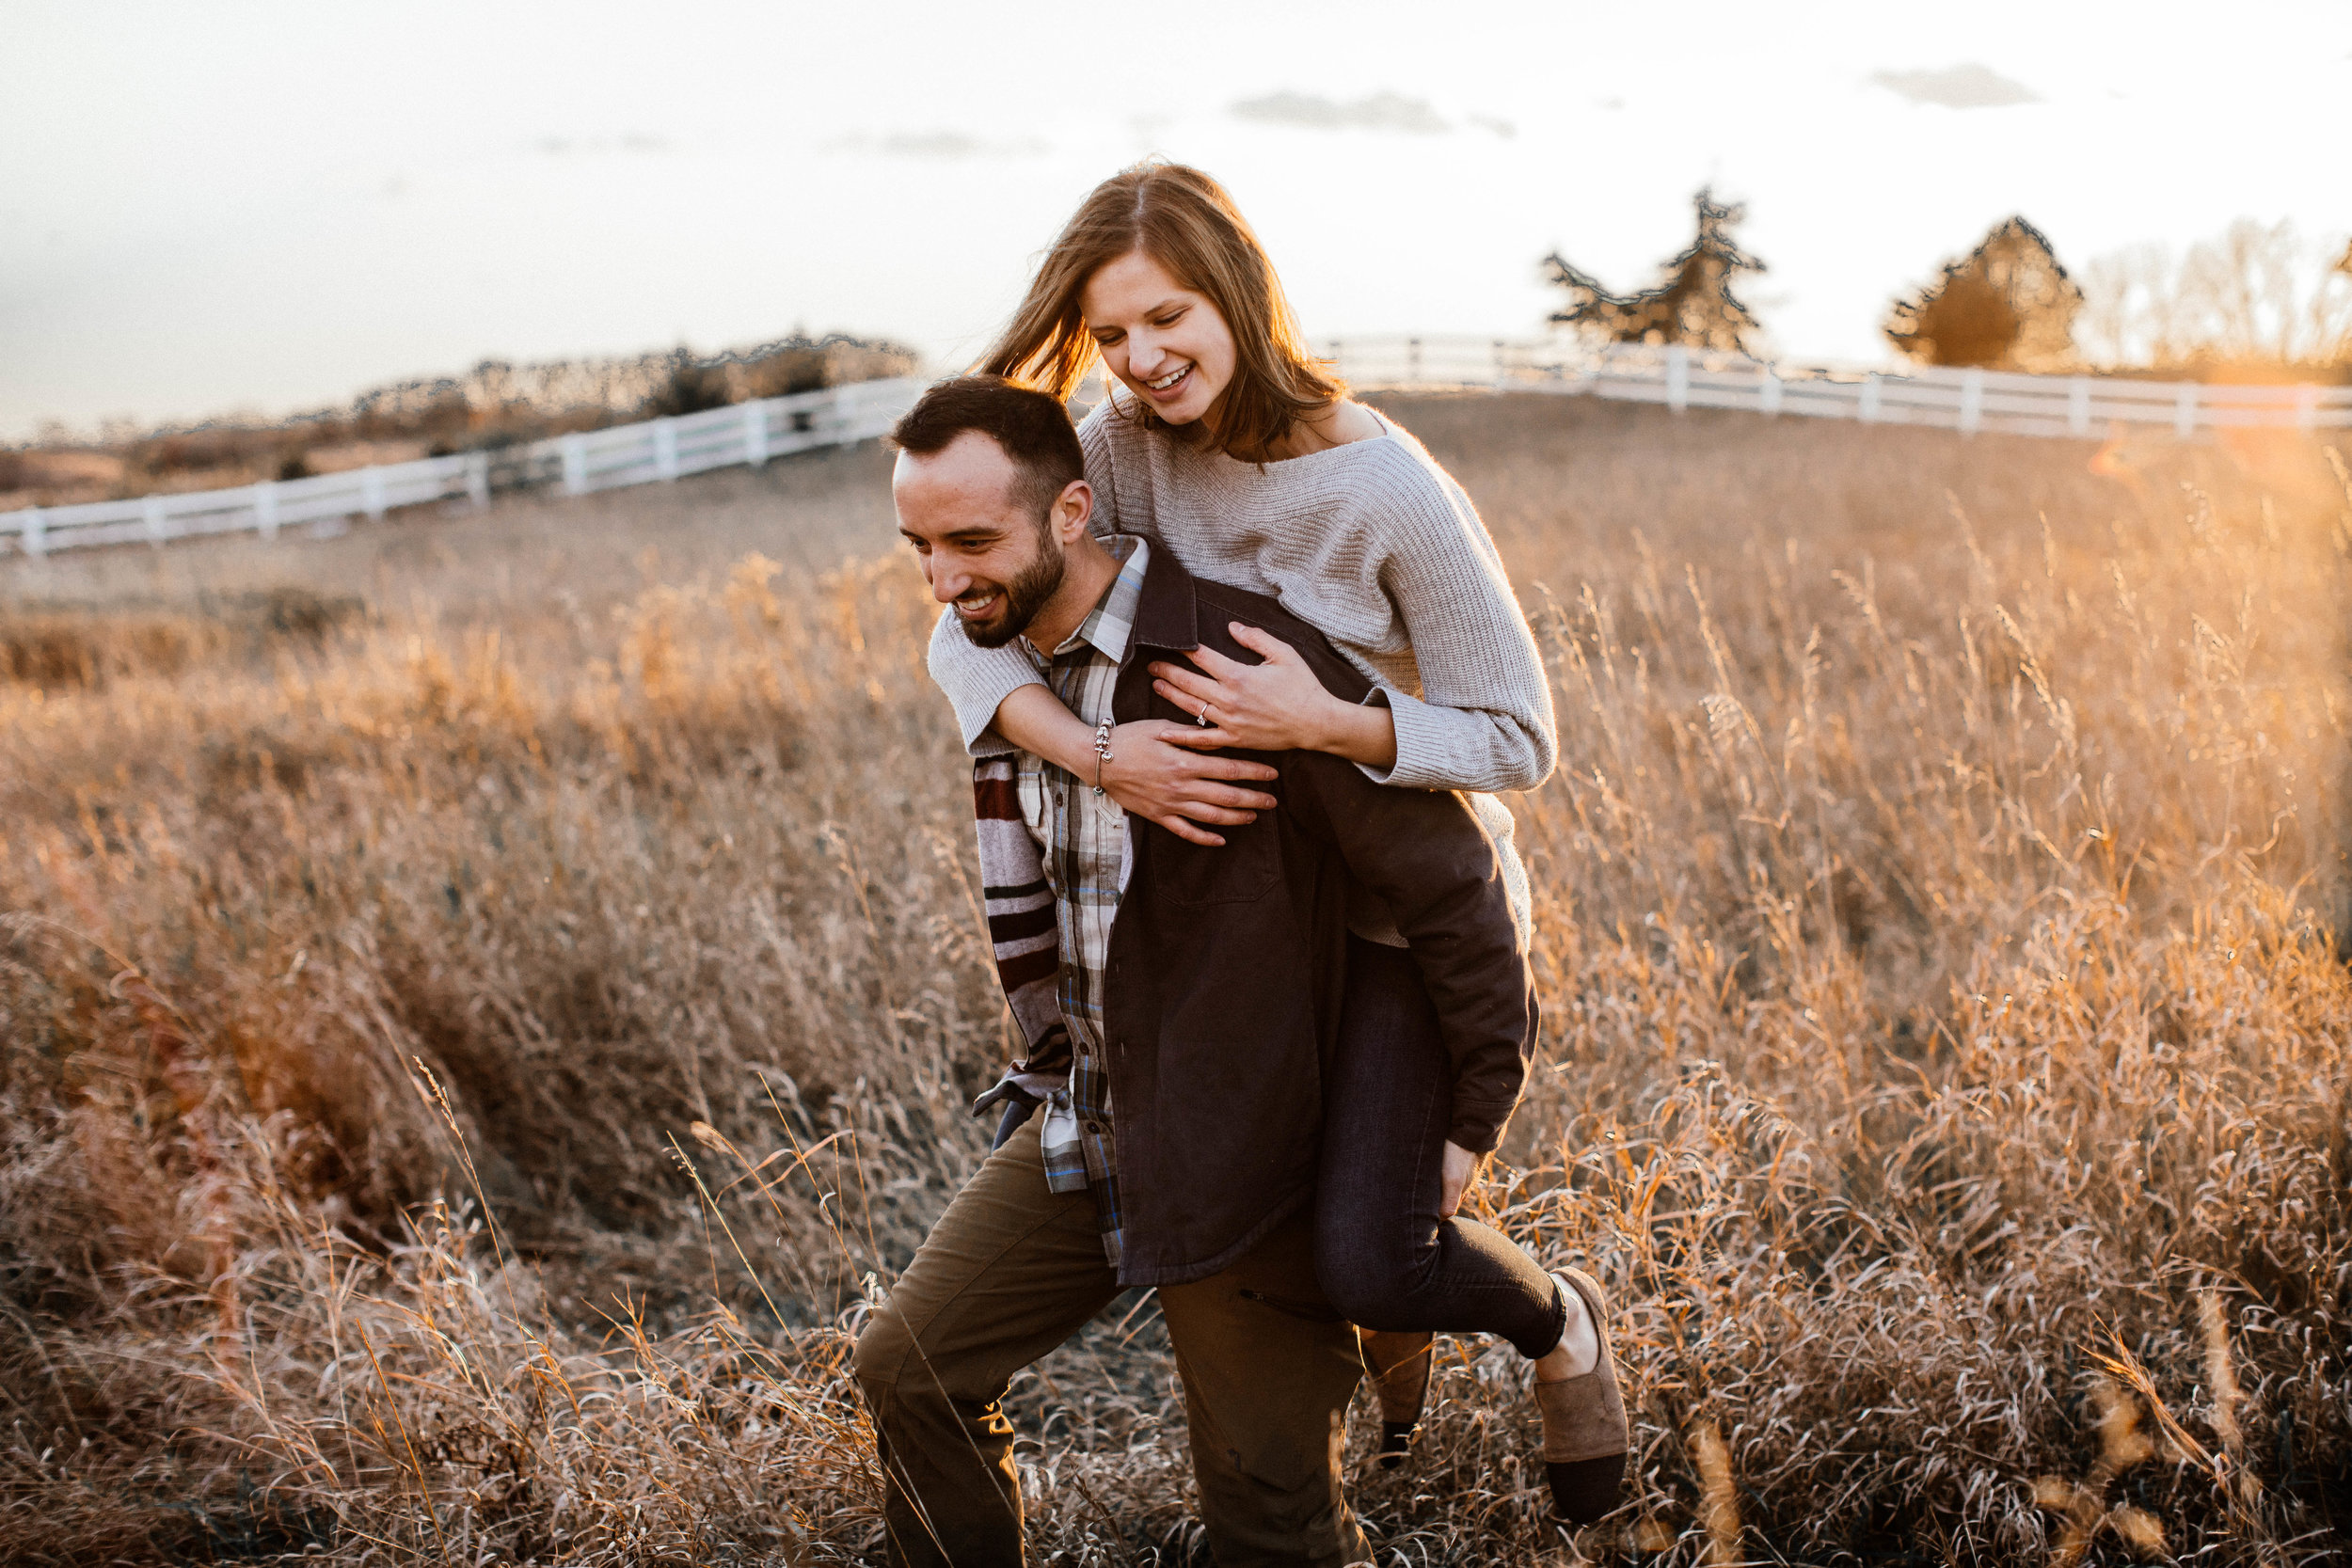 Outdoorsy autumn engagement shoot